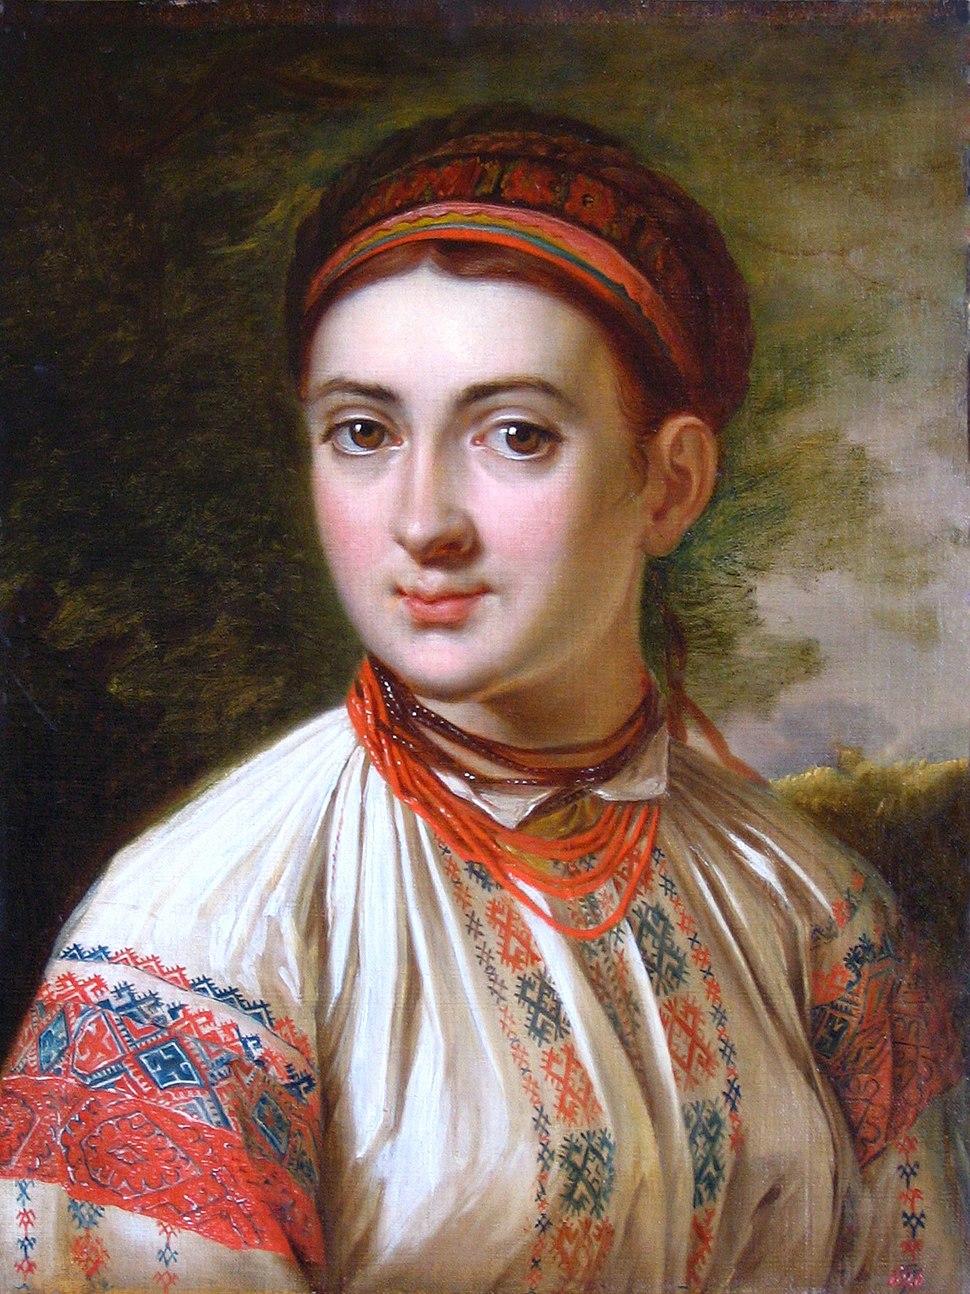 Girl from Podolye by V.Tropinin (b. 1821, Kursk)